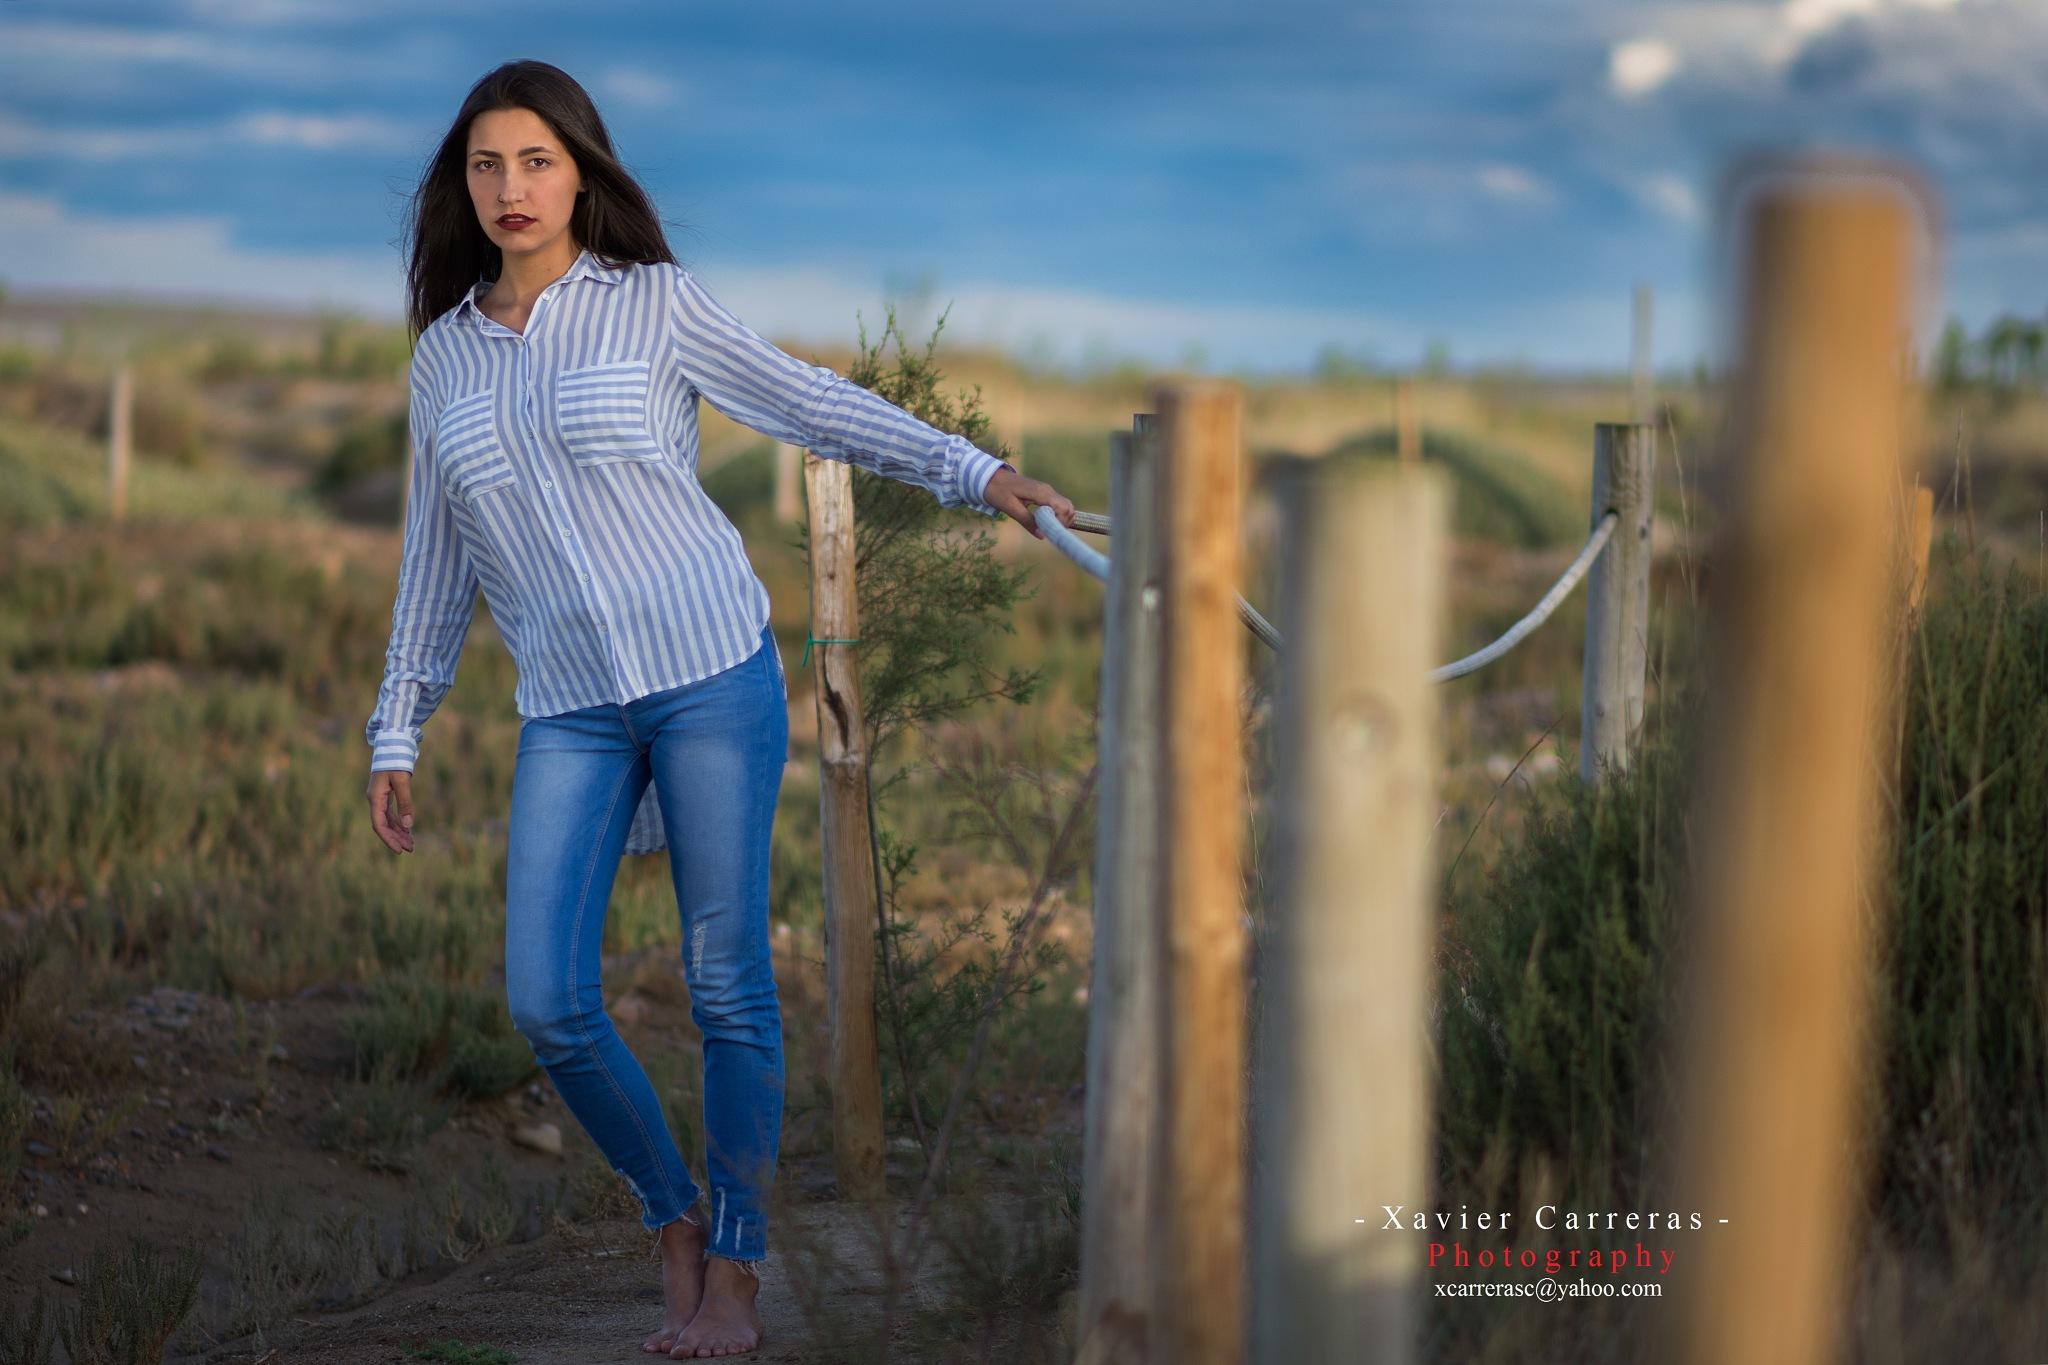 Saskia by Xavier Carreras Photography